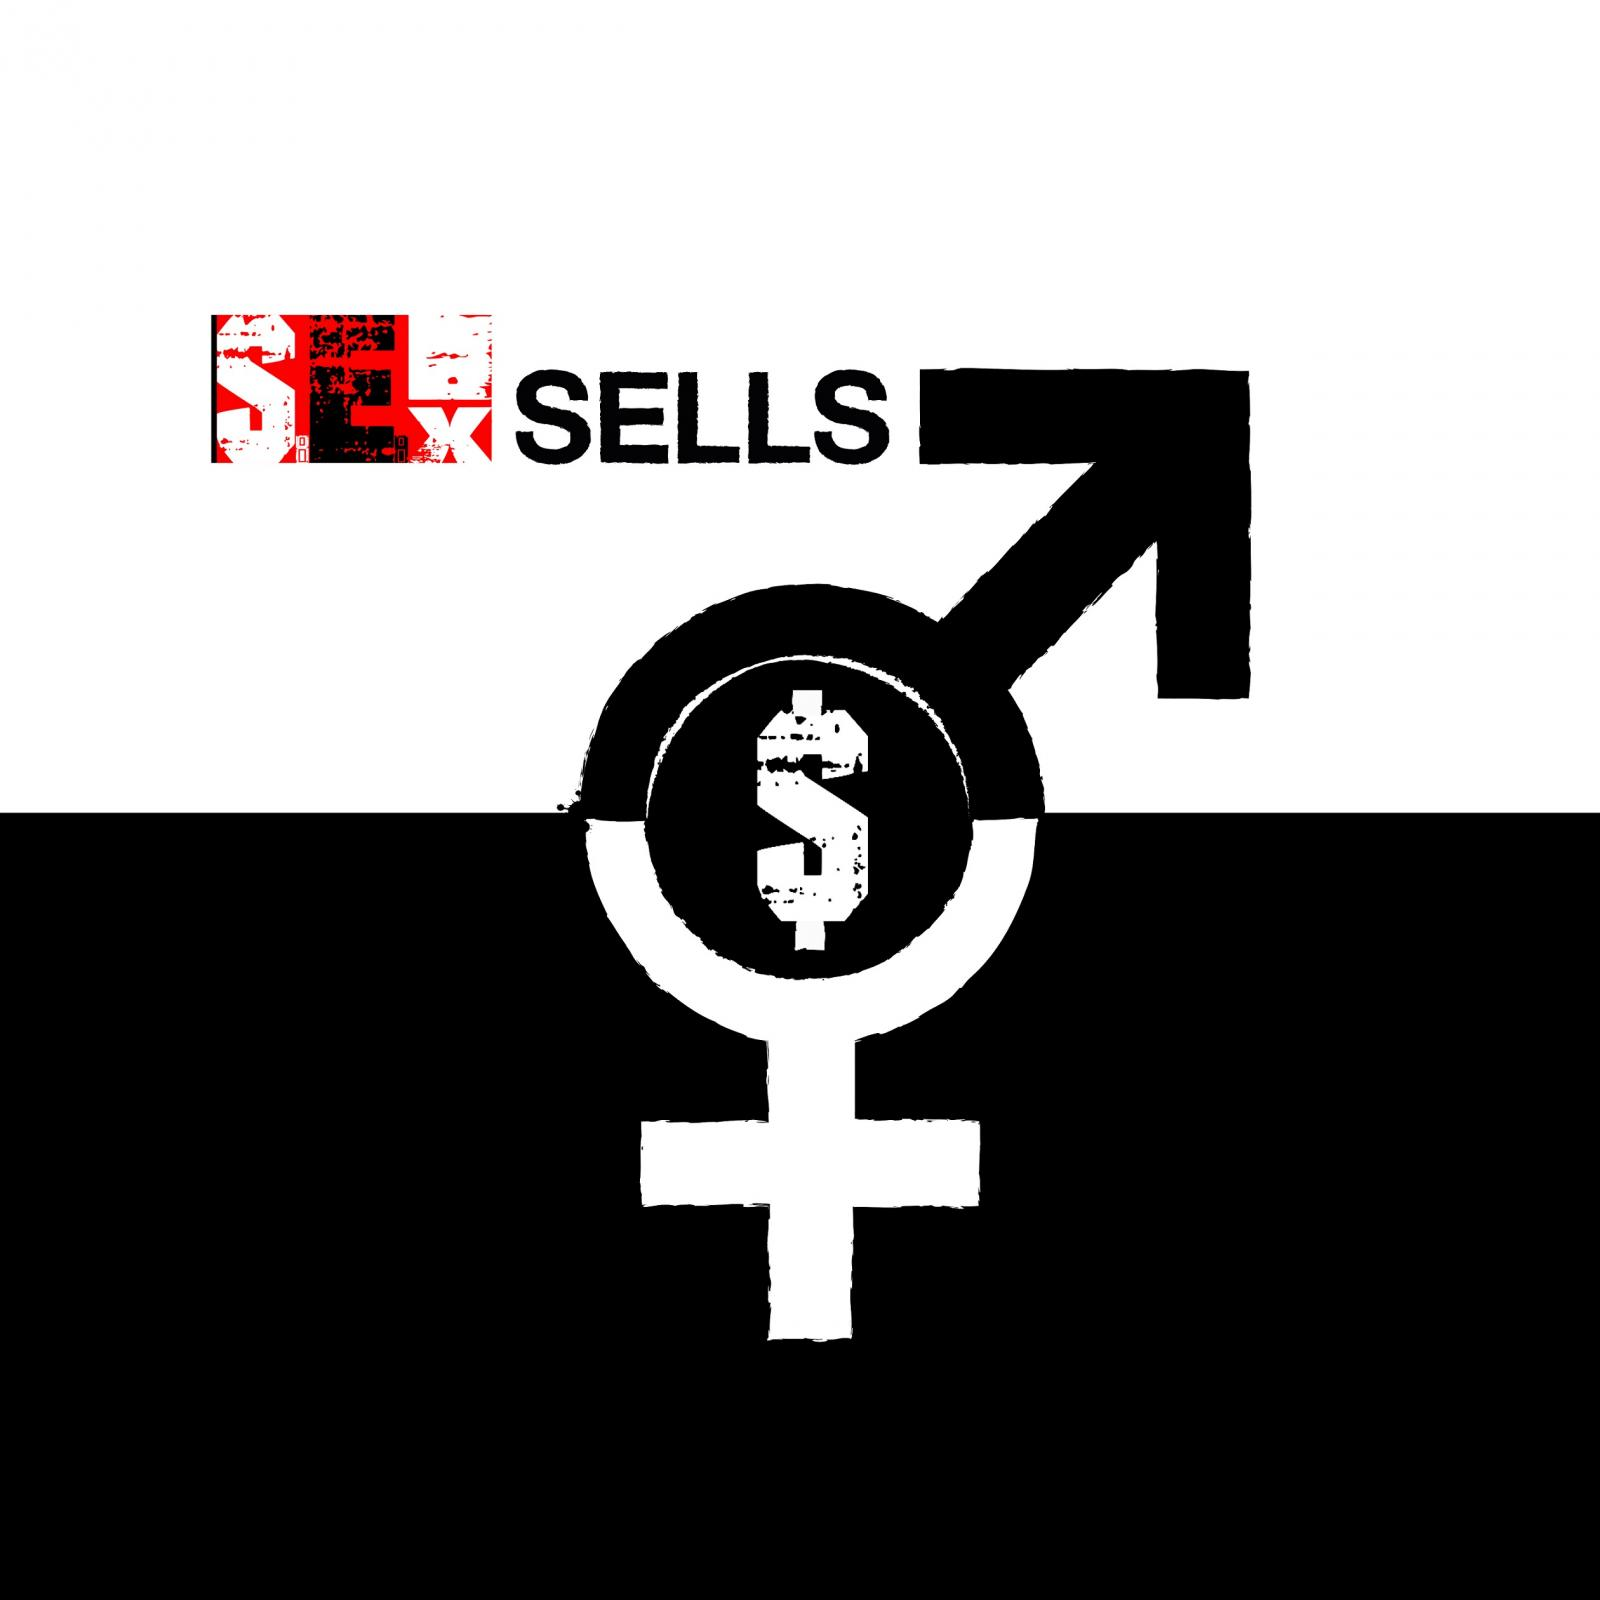 Upcoming: SEX - Sex Sells